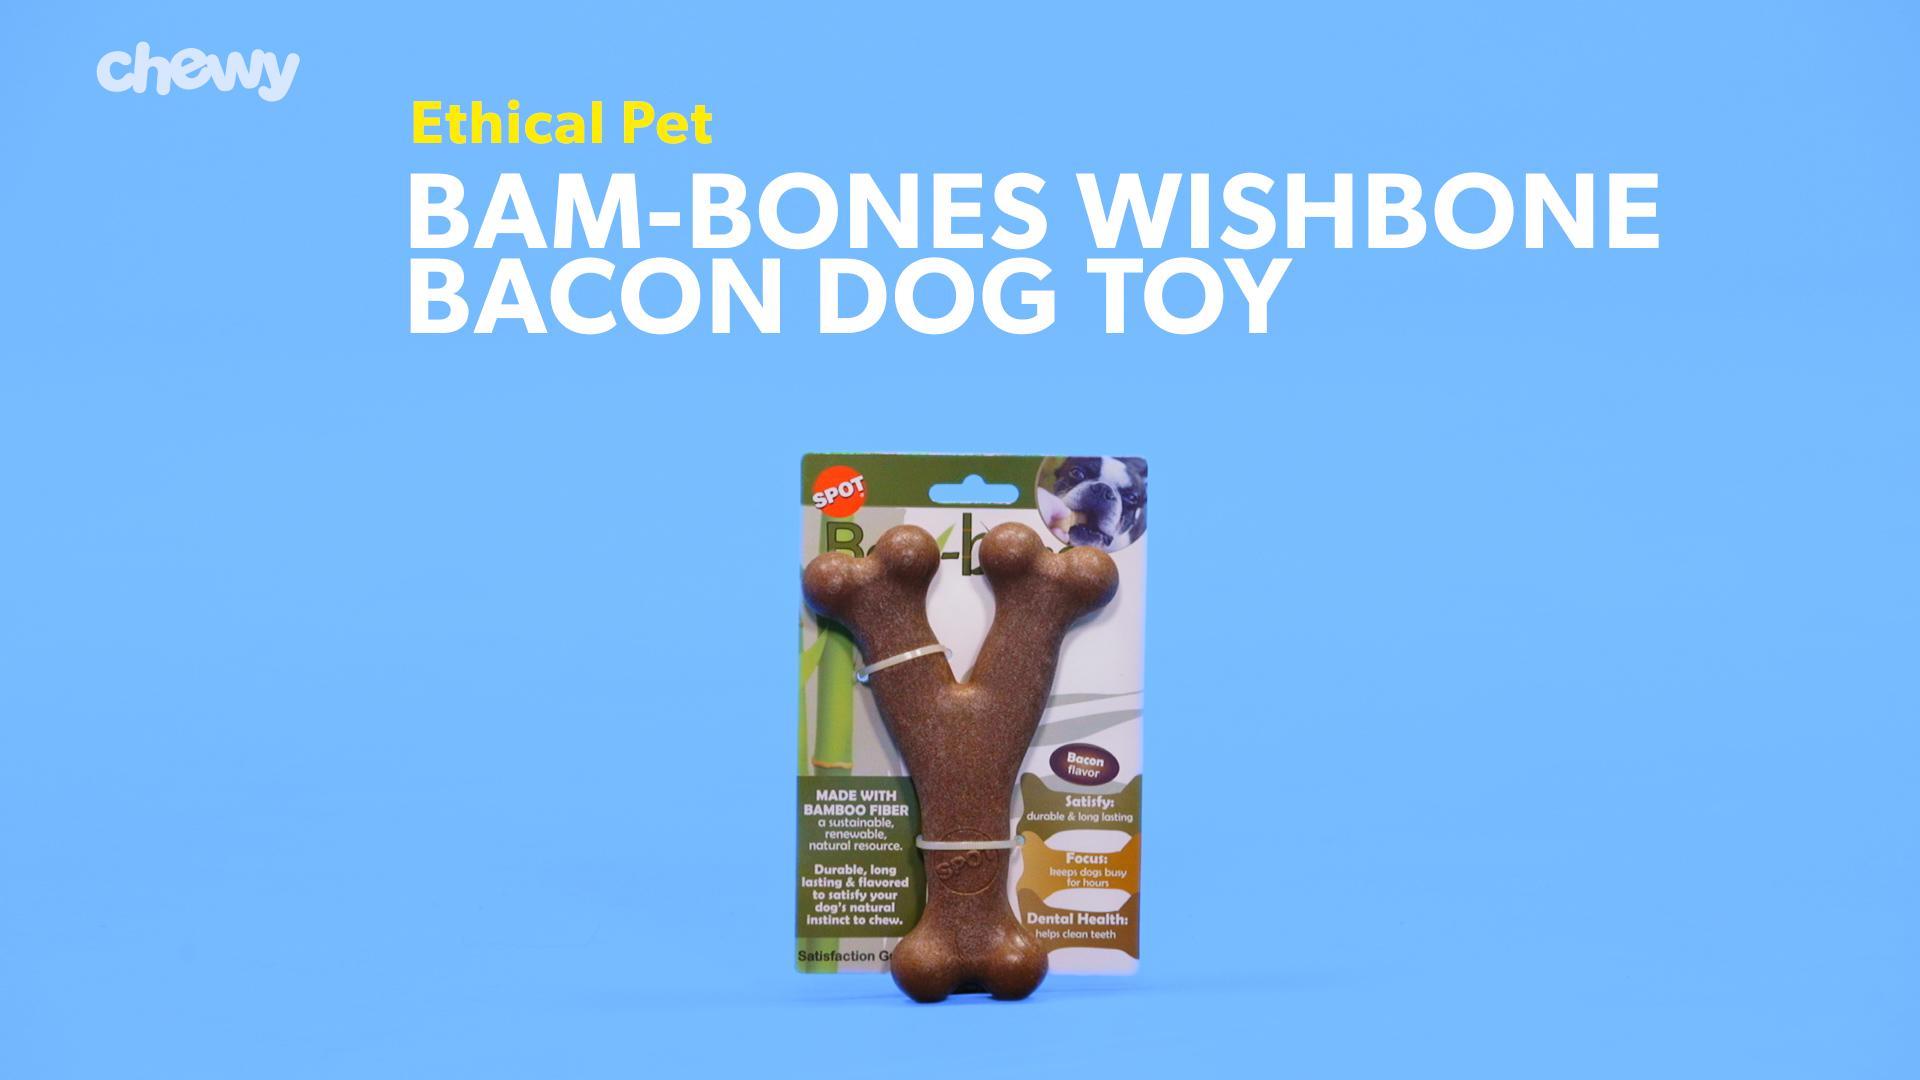 Ethical Spot Bambone Wish Bone Bacon Flavor 5.25 Inch **Free Shipping**